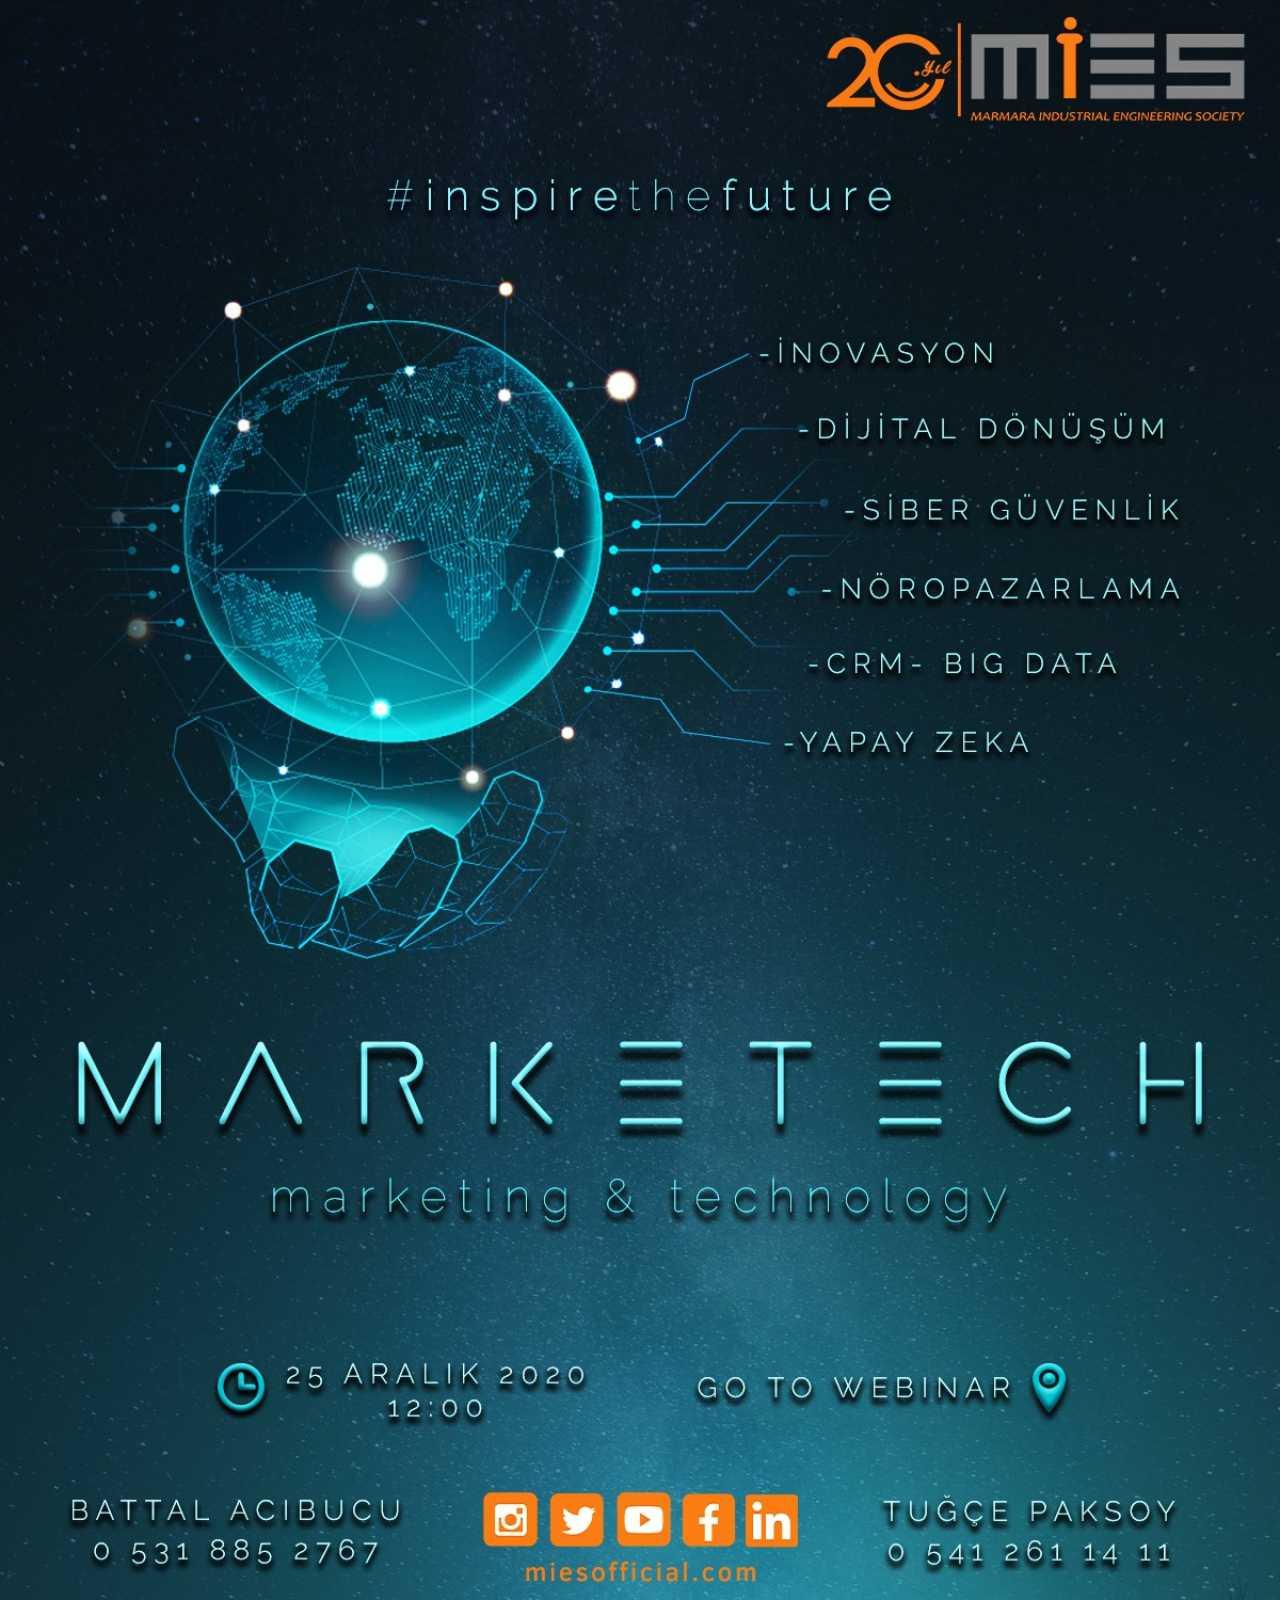 marketech